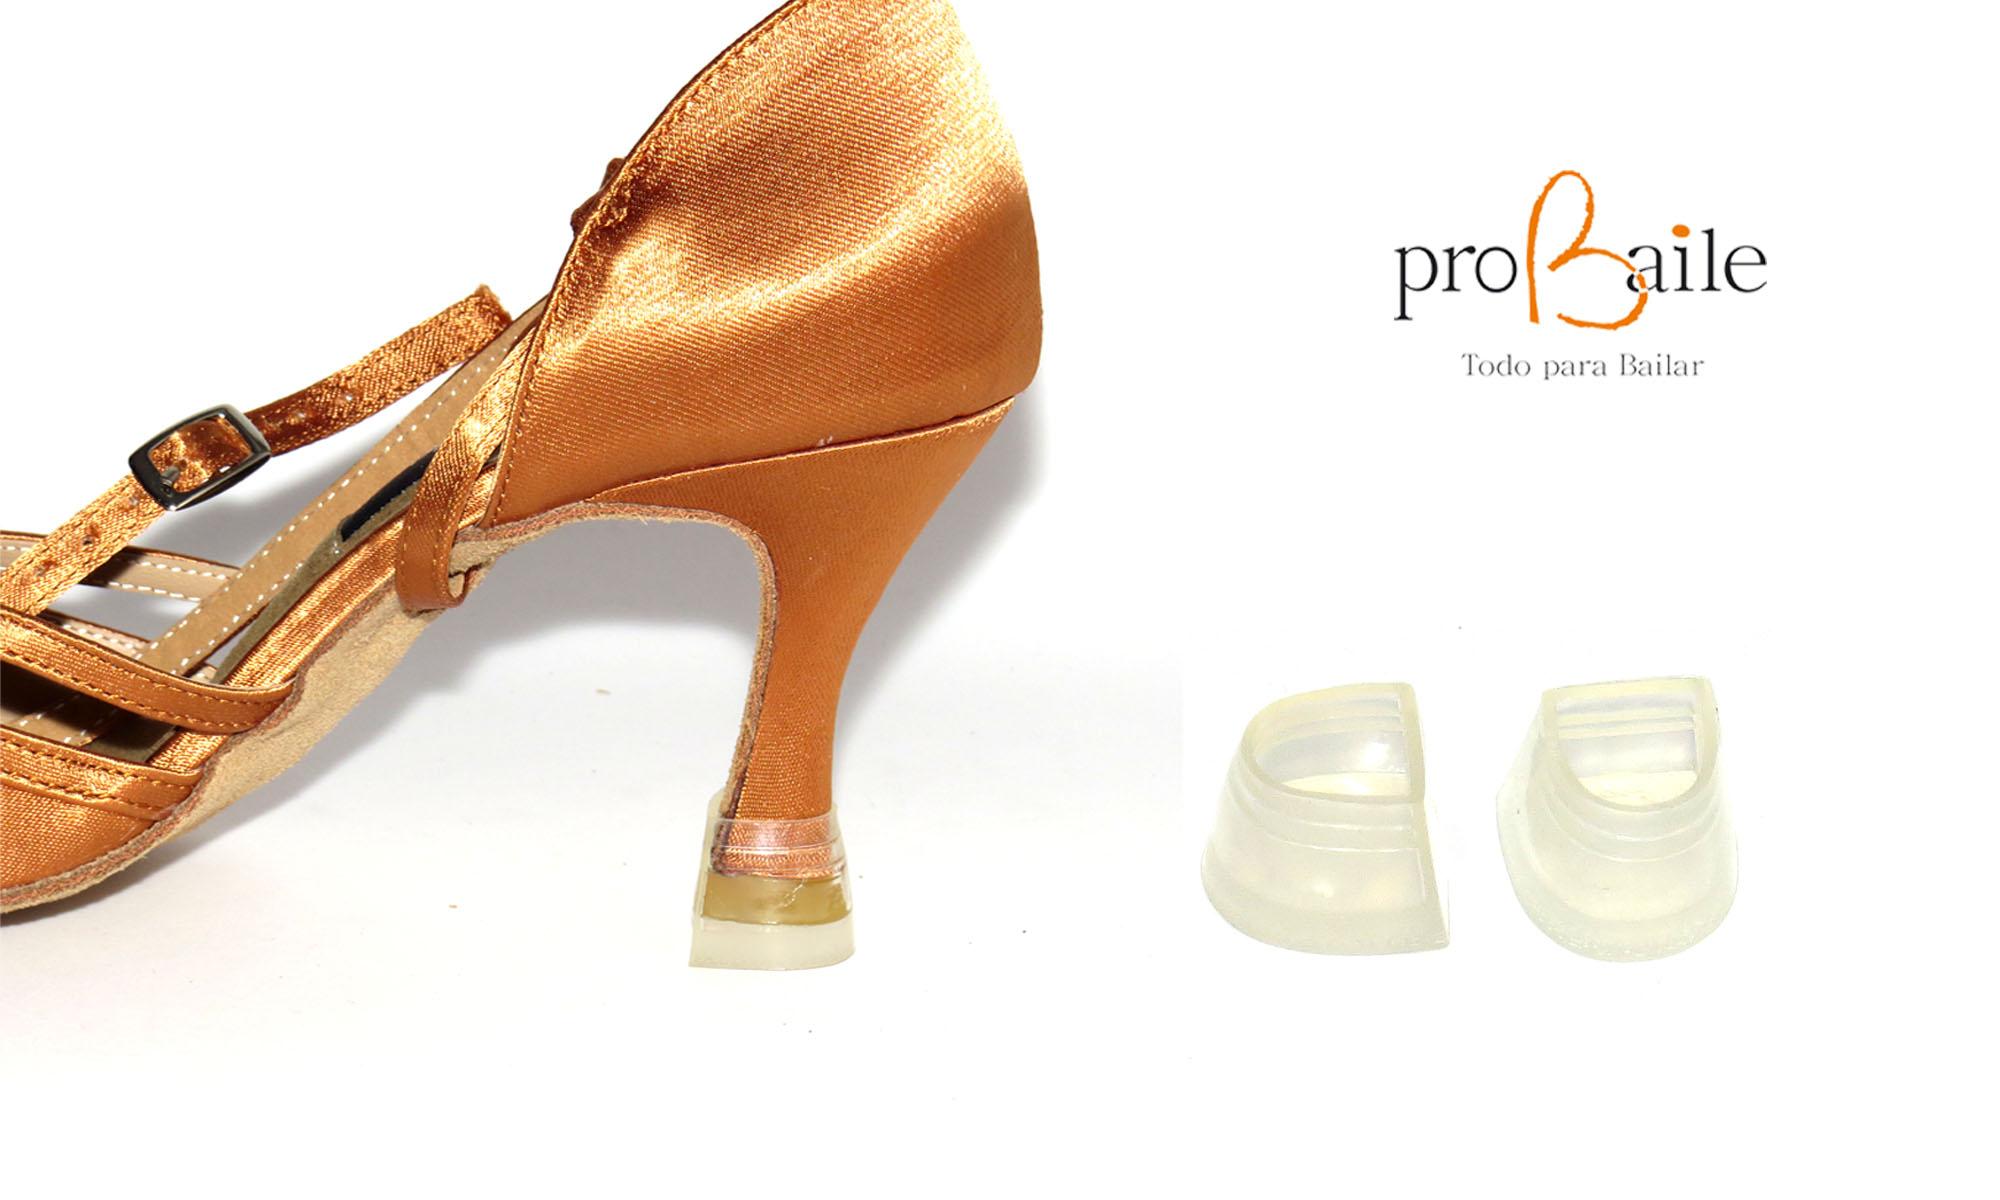 Protectores de tac n para zapatos de baile de alta calidad - Fundas para zapatos ...